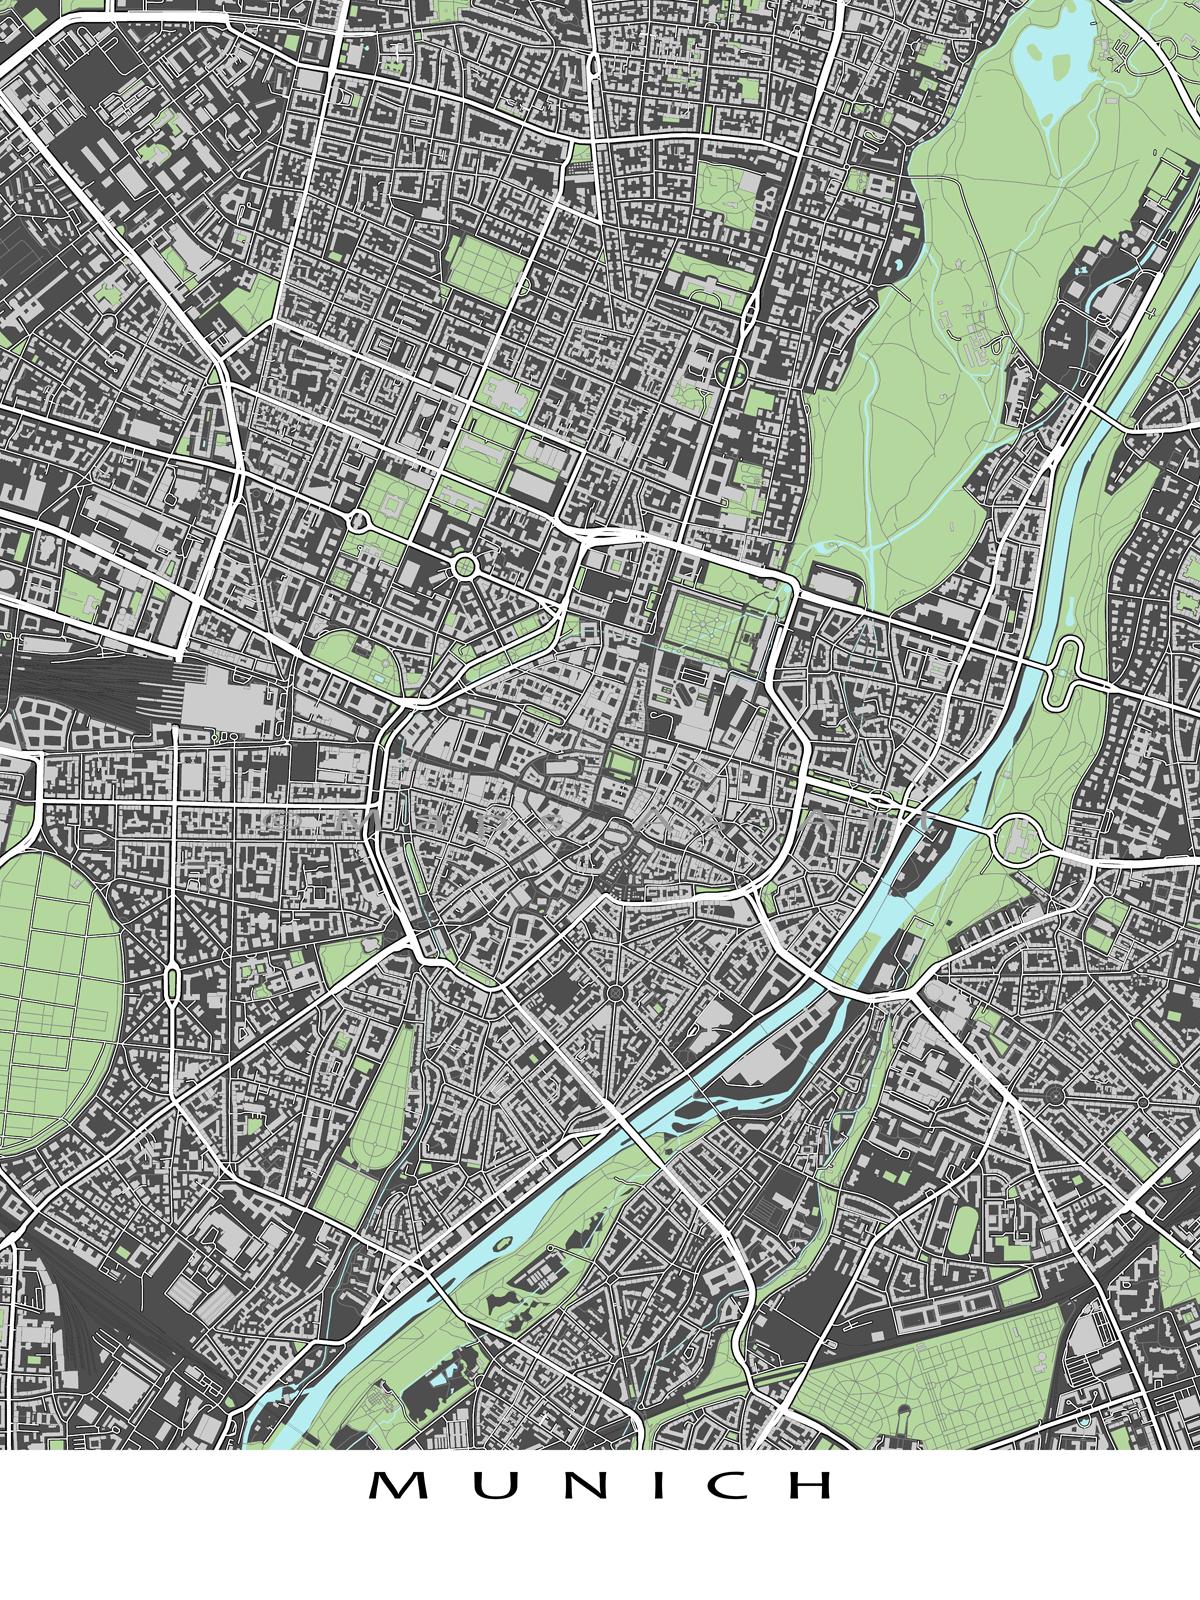 Munich Germany, City Map Print, Street Map, Buildings, Munich Map ...